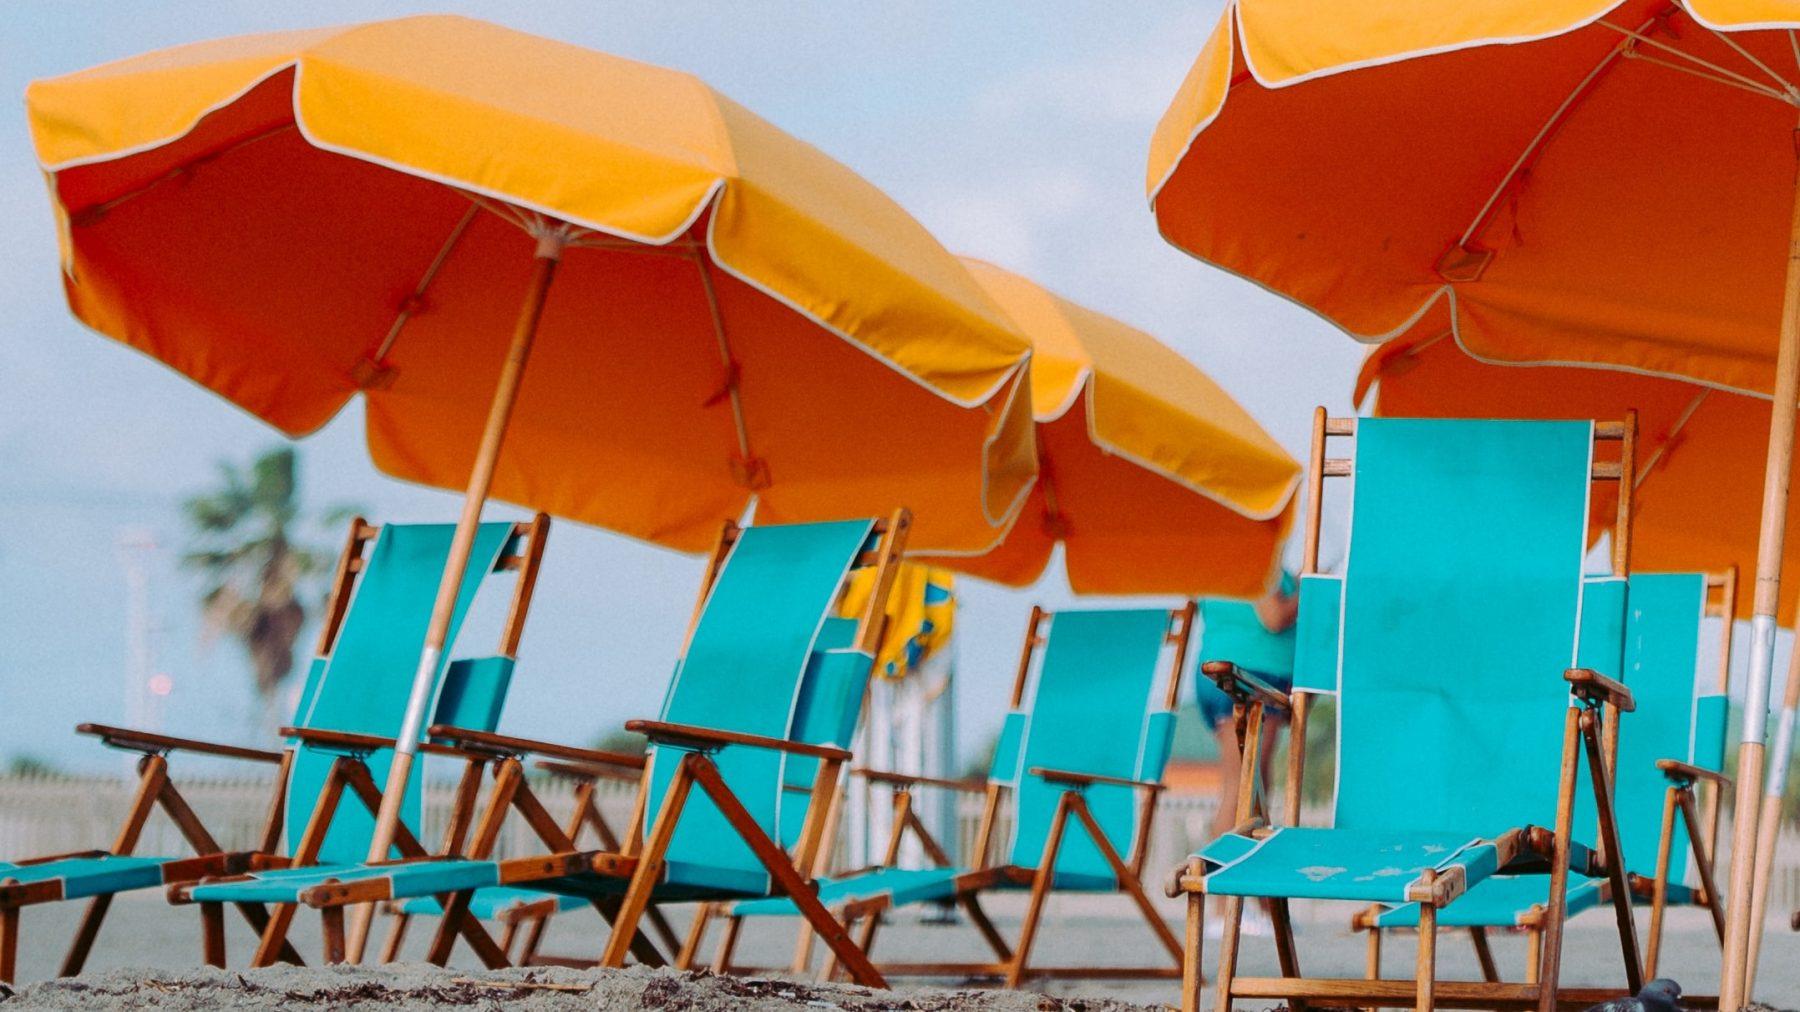 Stof je strandhanddoek maar weer af, dinsdag wordt het 30 graden